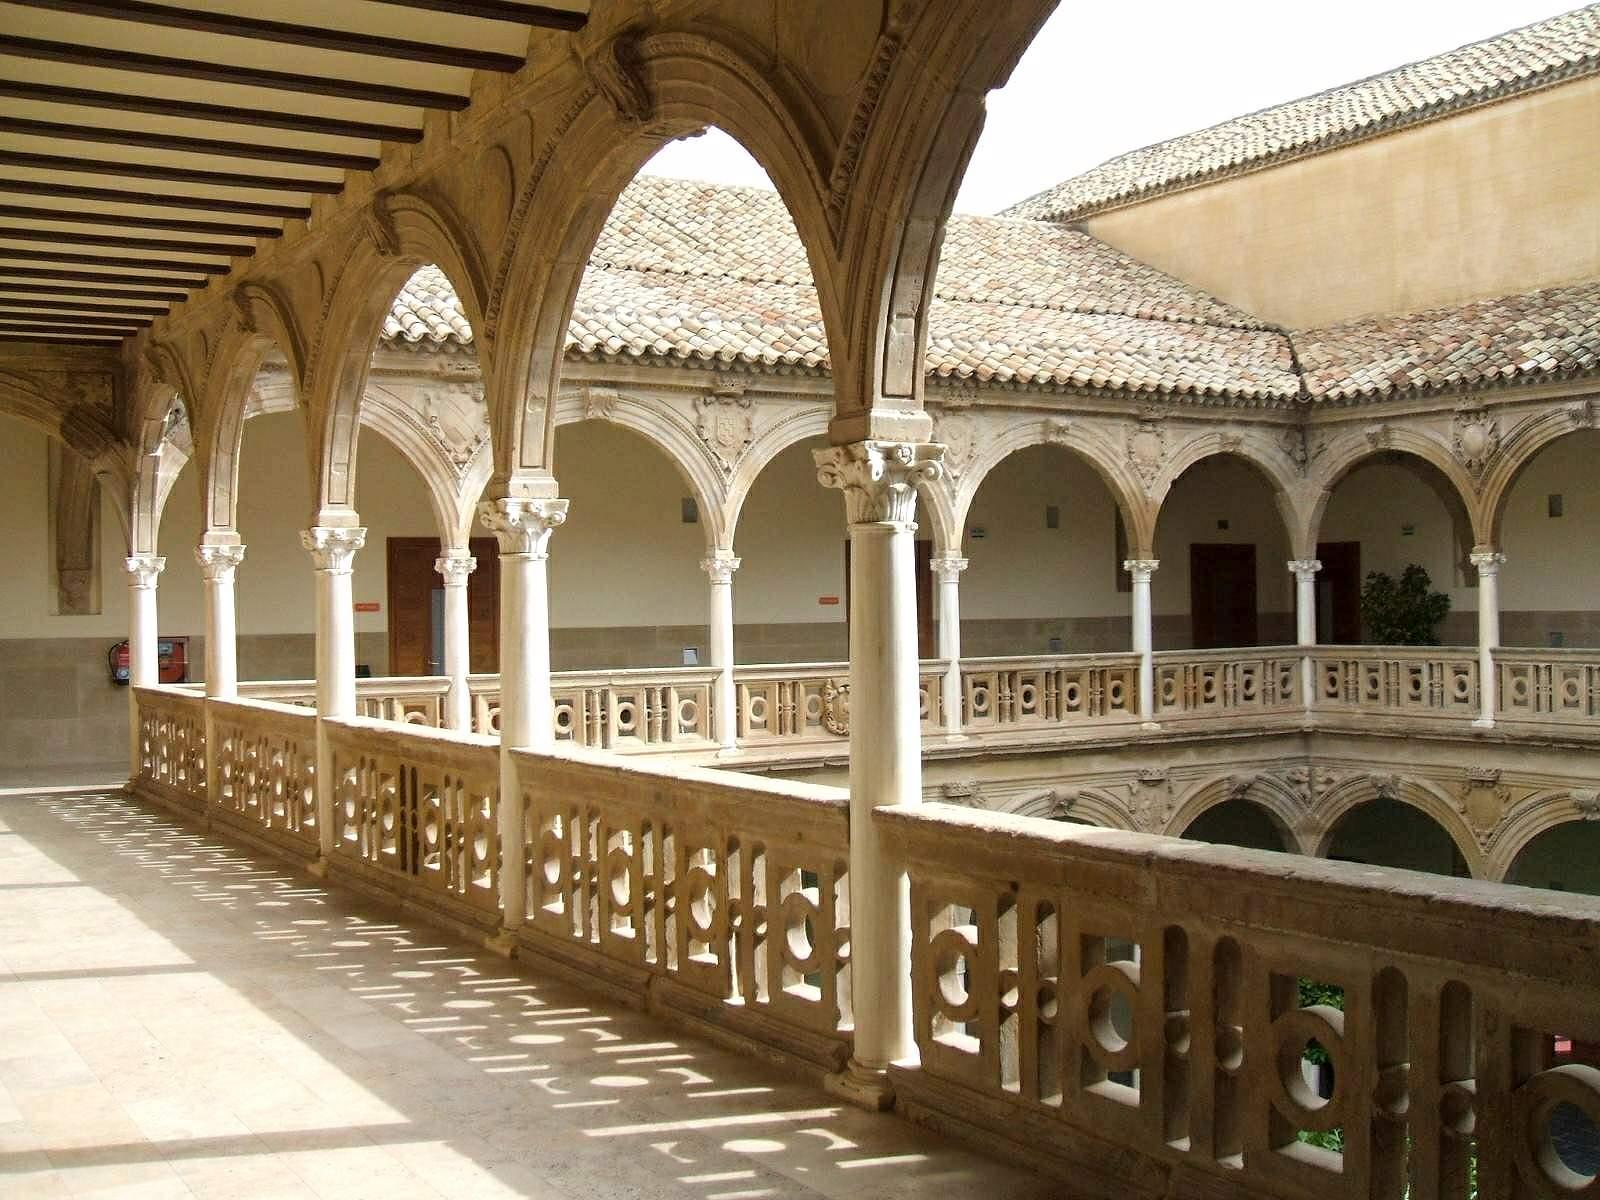 File:Baeza - Palacio Jabalquinto 21.jpg - Wikimedia Commons